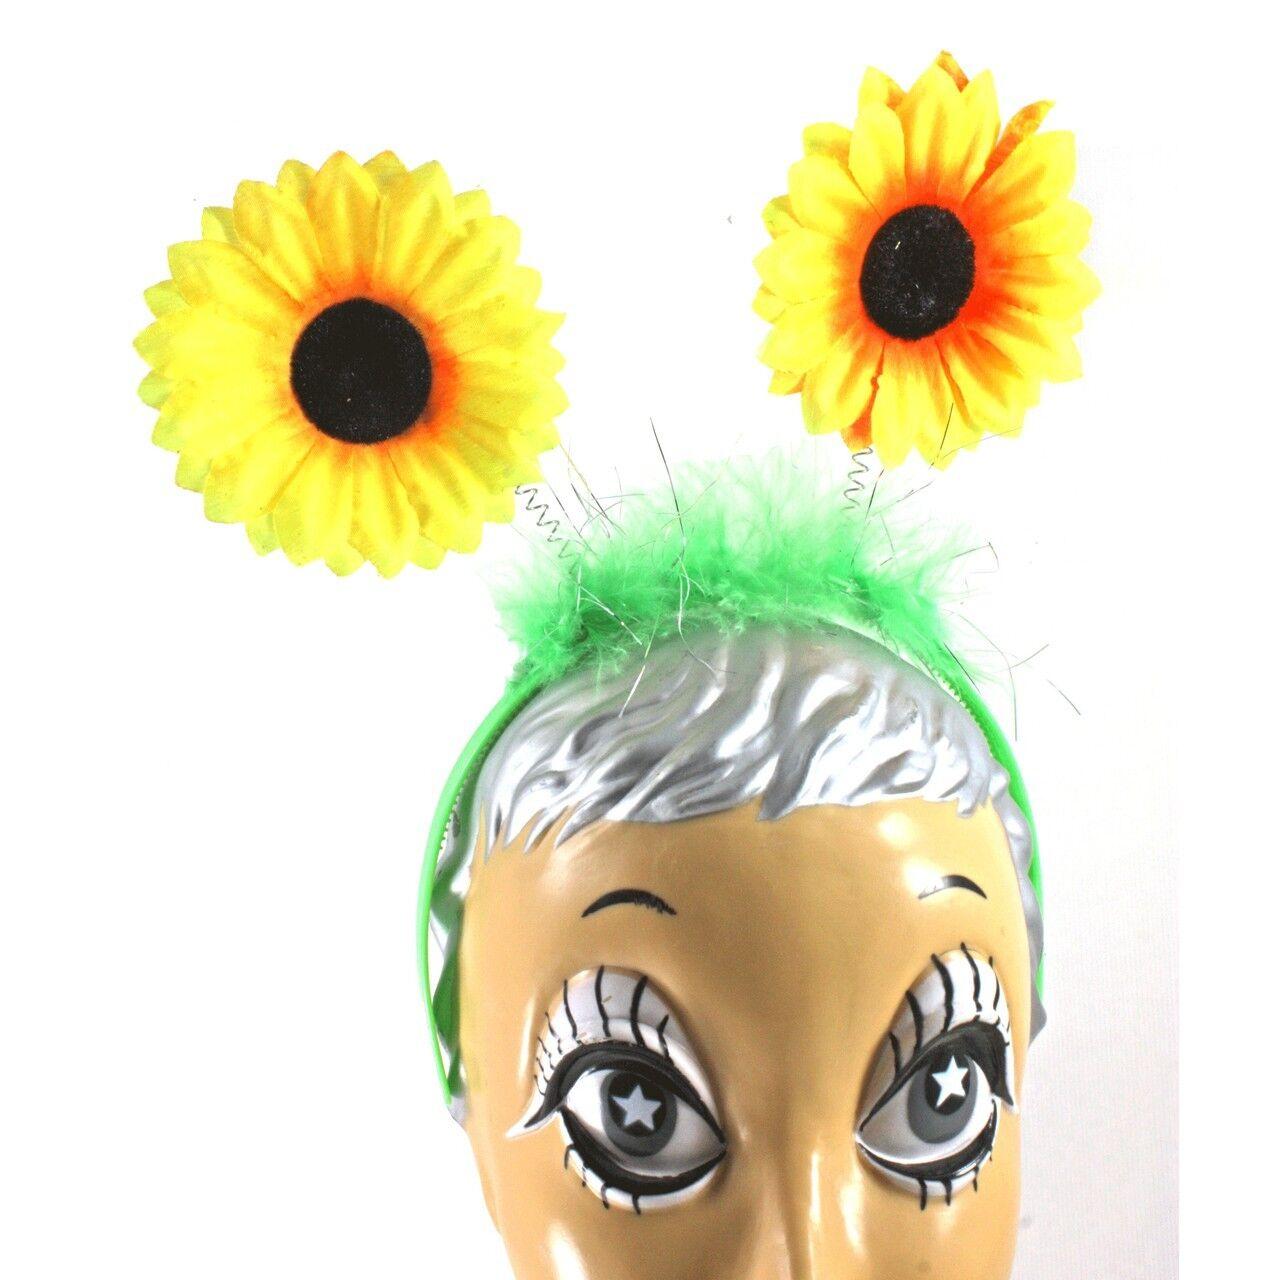 Sunflower Flower Headpiece Antenna With Yellow Flowers Costume